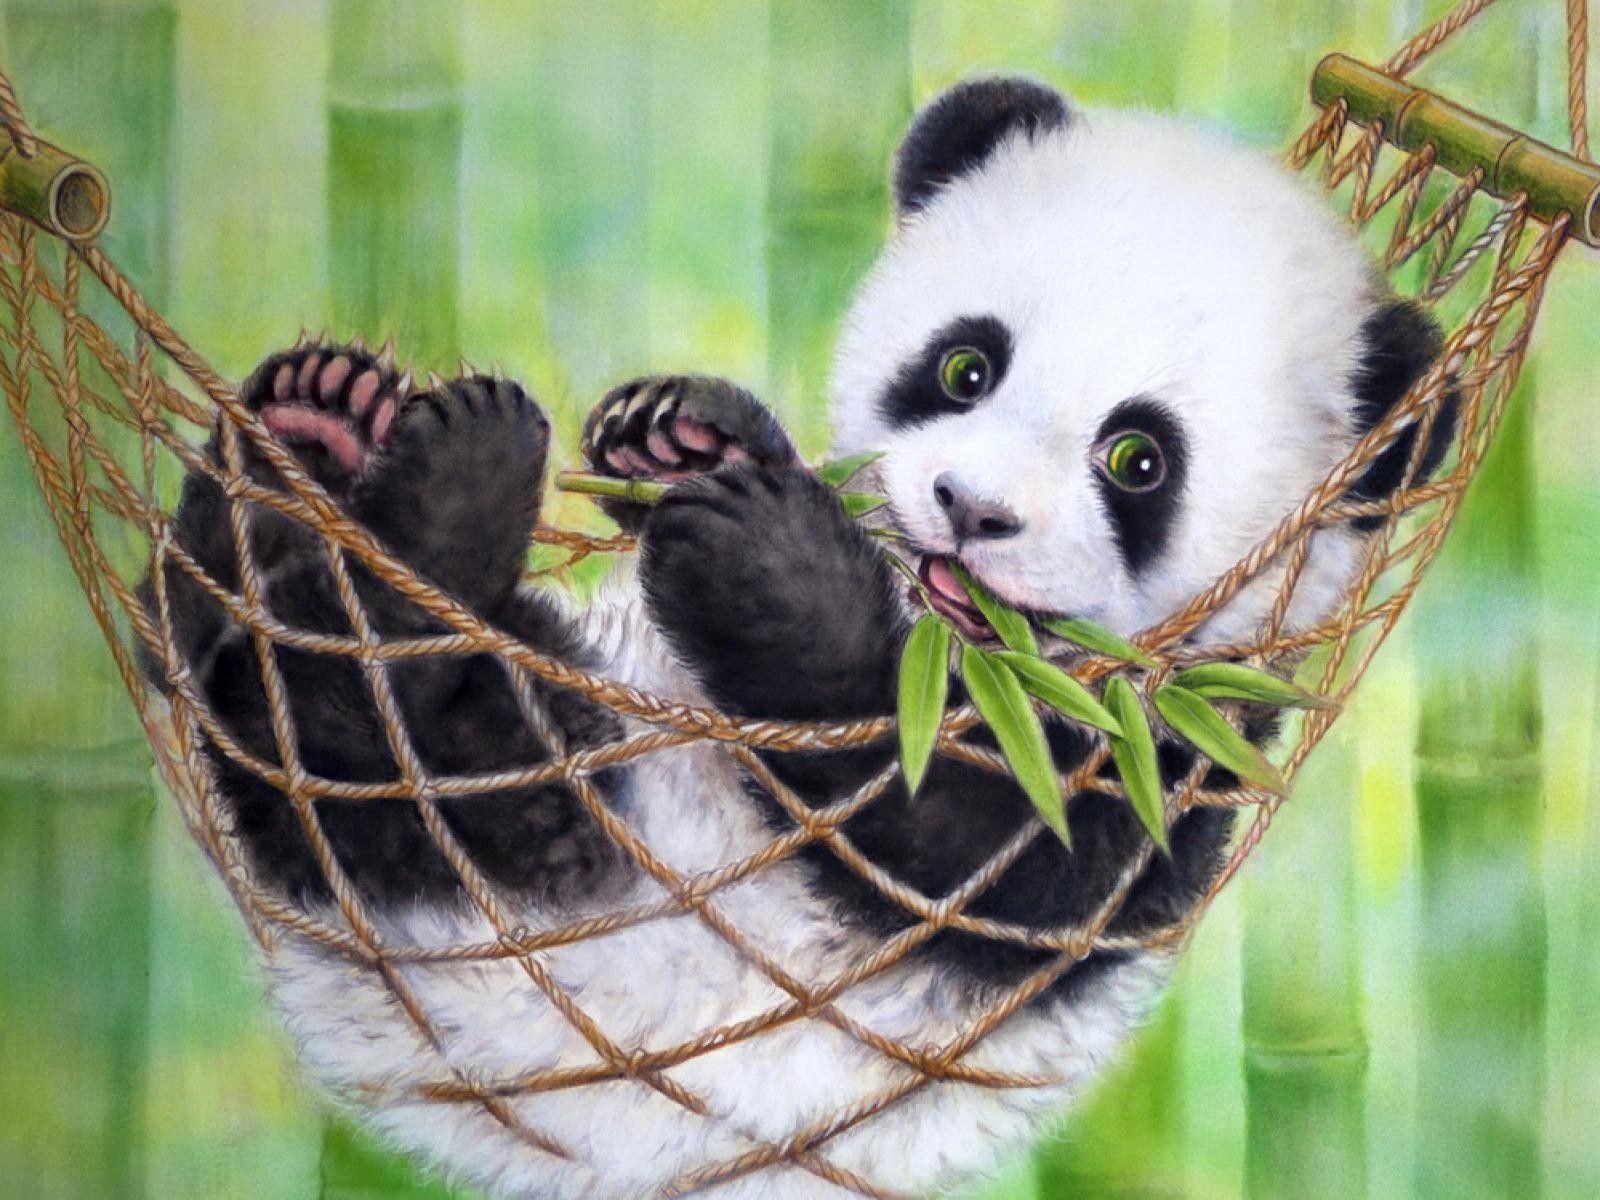 Free Download Cute Panda Wallpapers Tumblr Wallpapers Backgrounds Images Art Photos Cute Panda Wallpaper Panda Painting Cute Panda